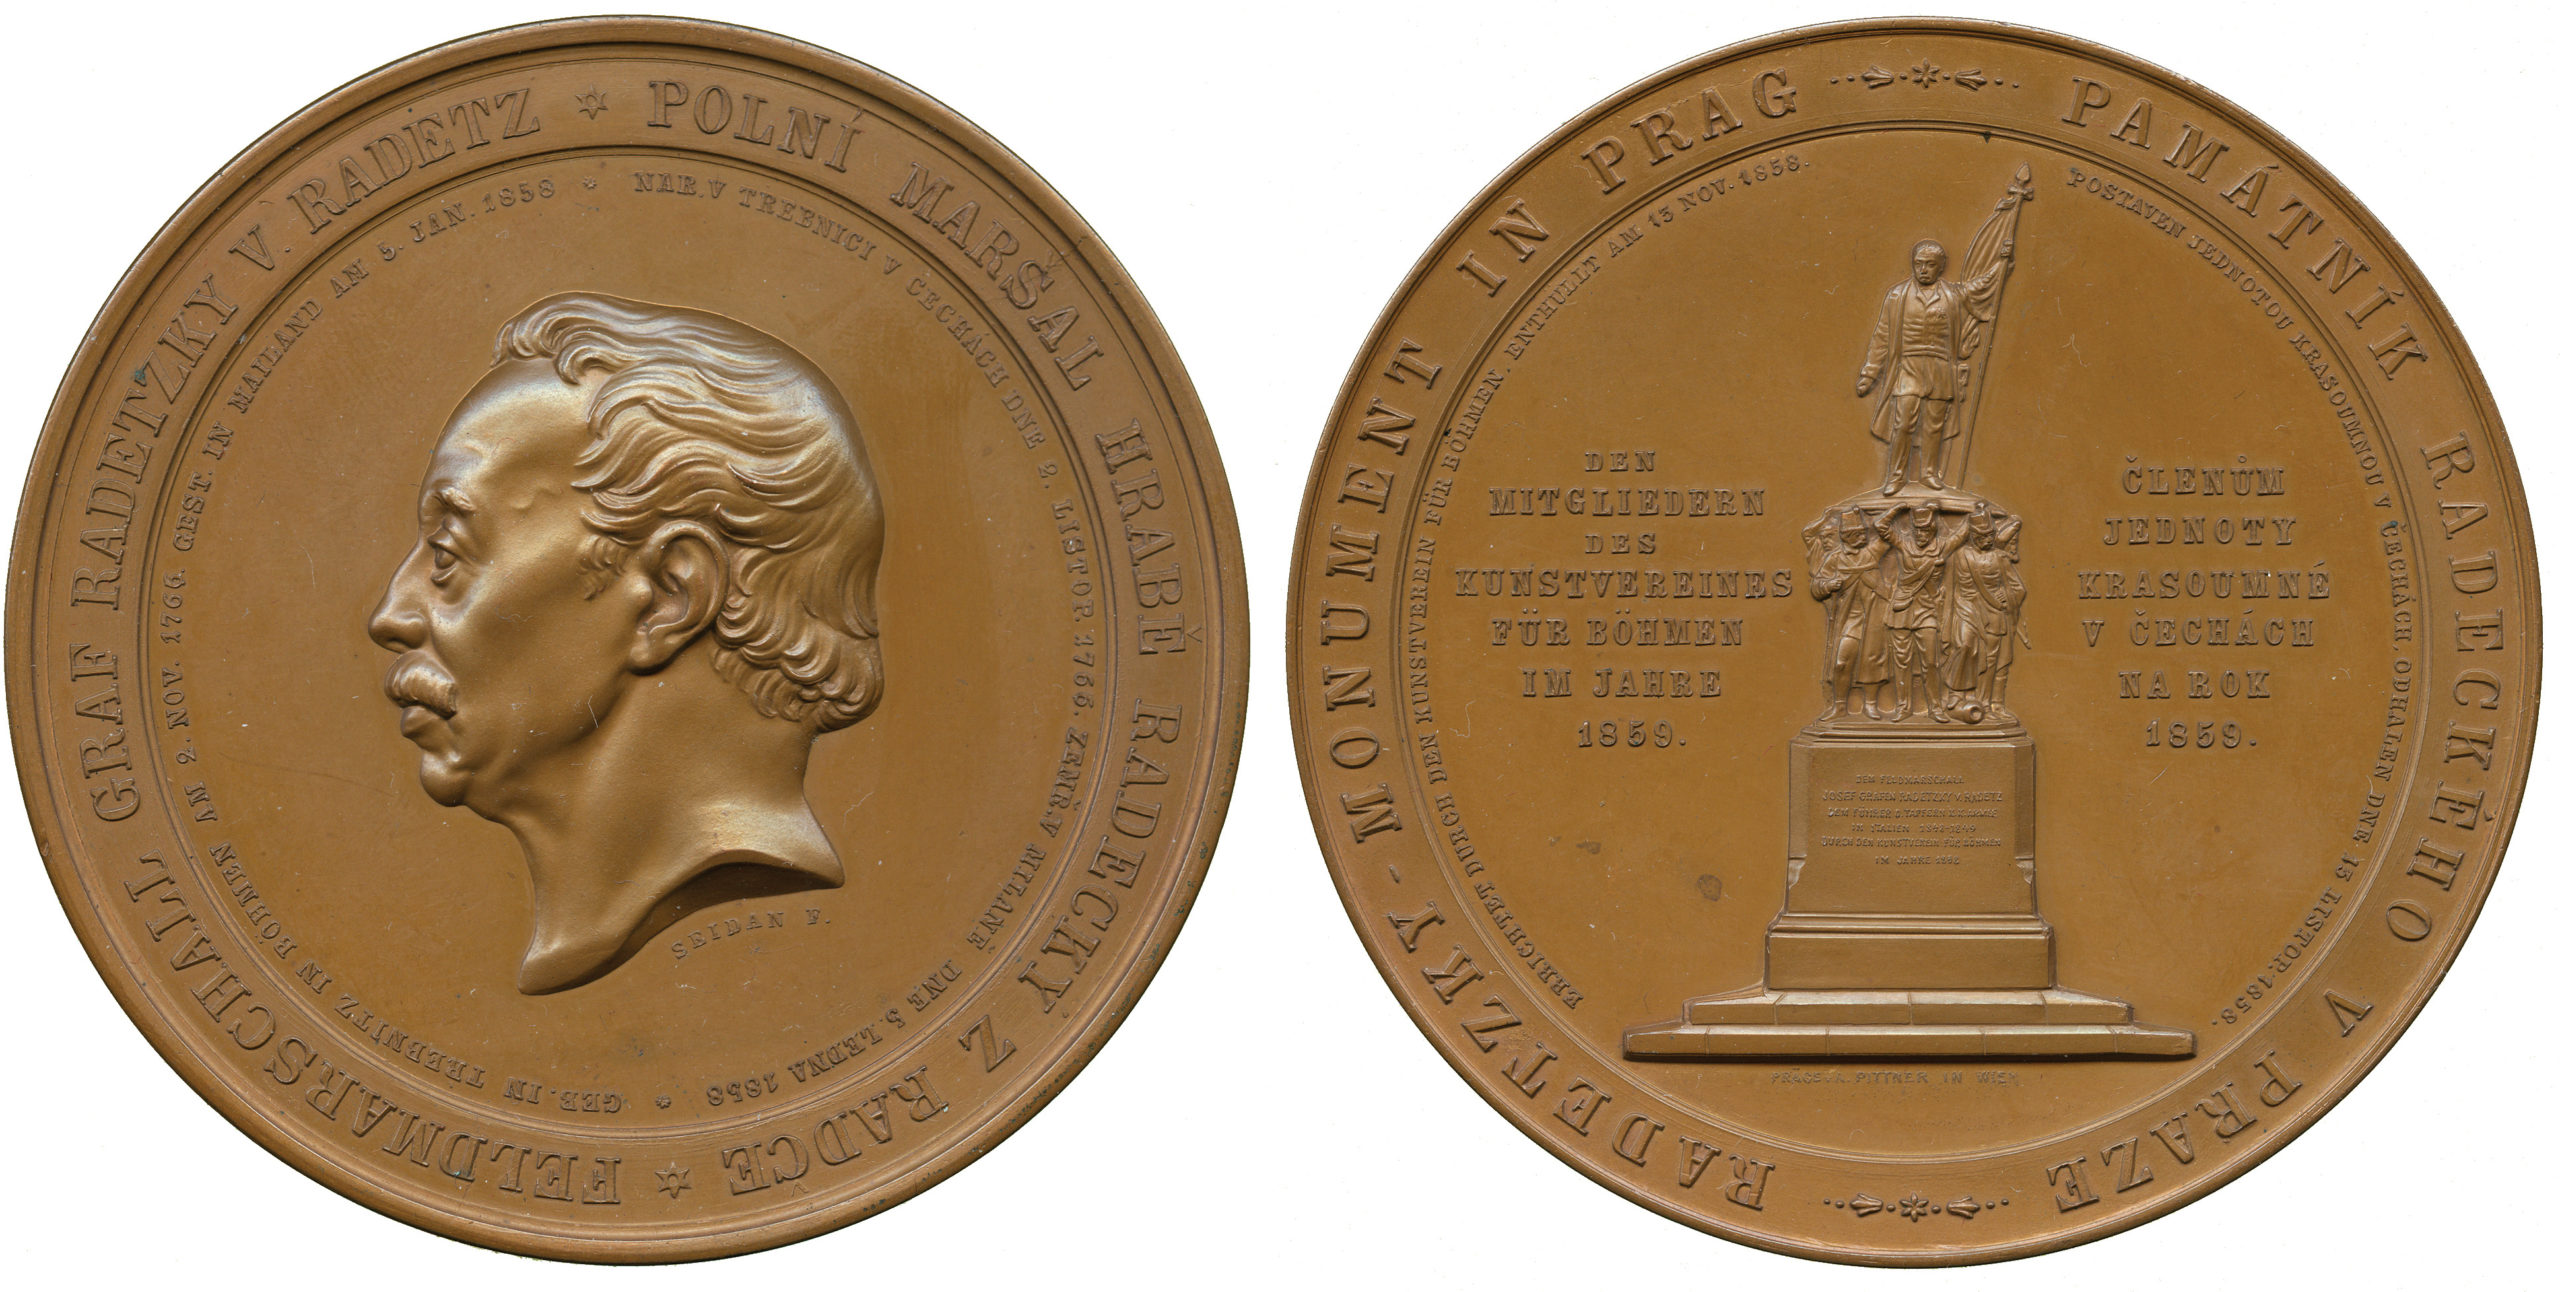 Austria, Count Radetzky, Statue in Prague, Medal, 1859